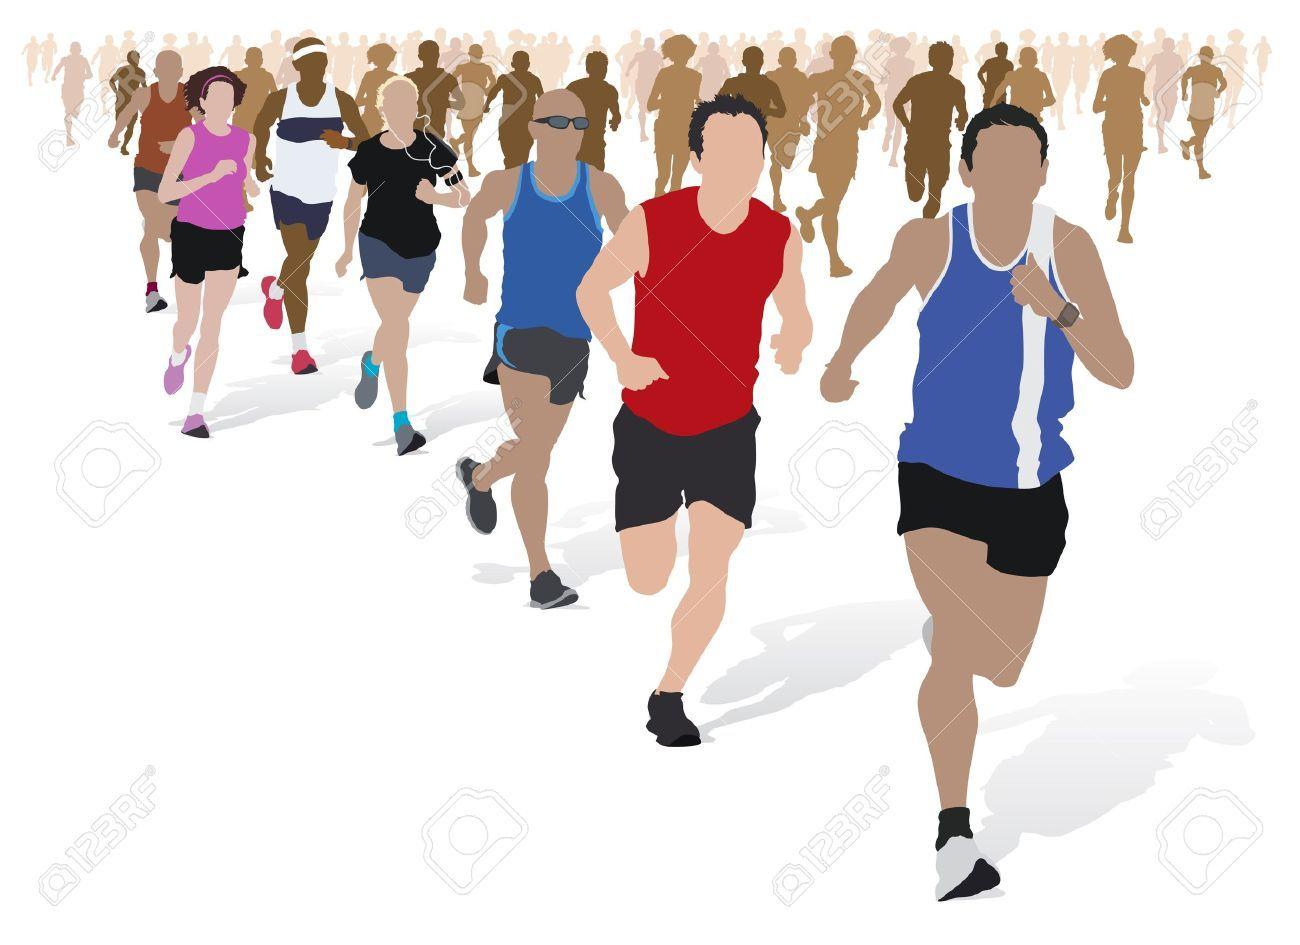 Marathon clipart » Clipart Portal.